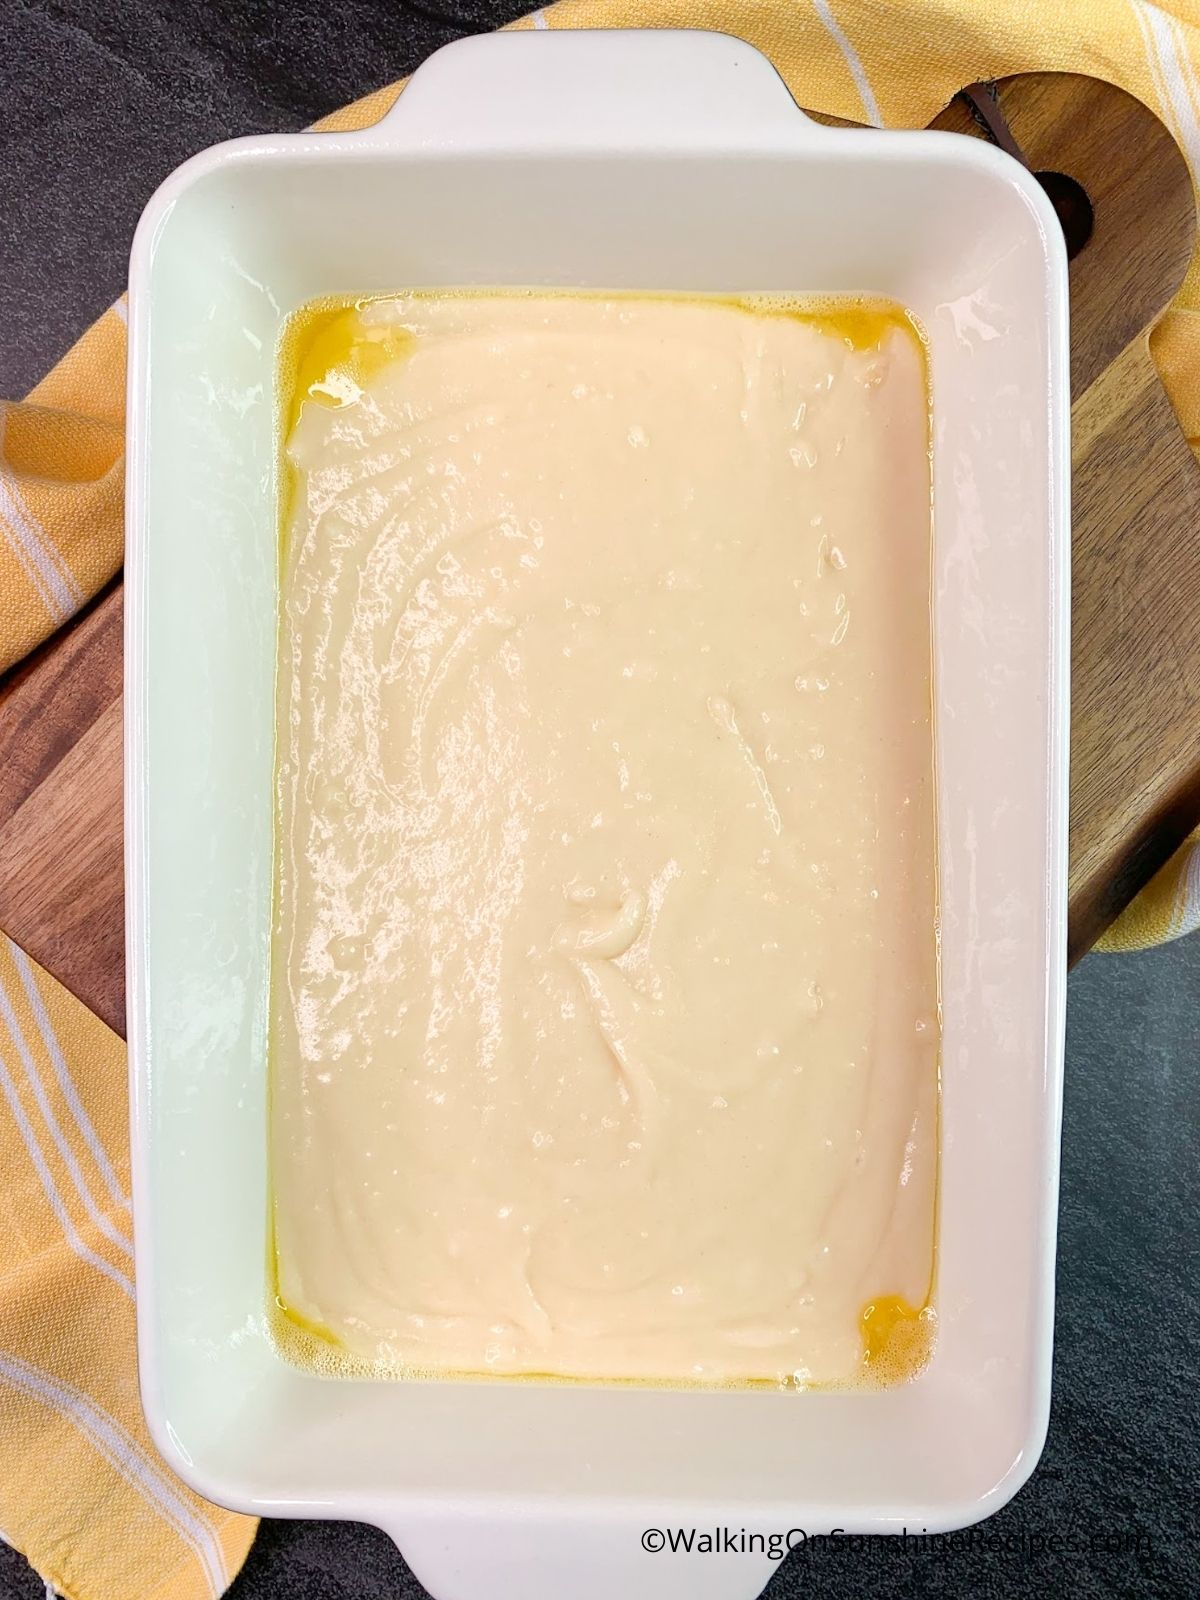 Add batter to baking dish.